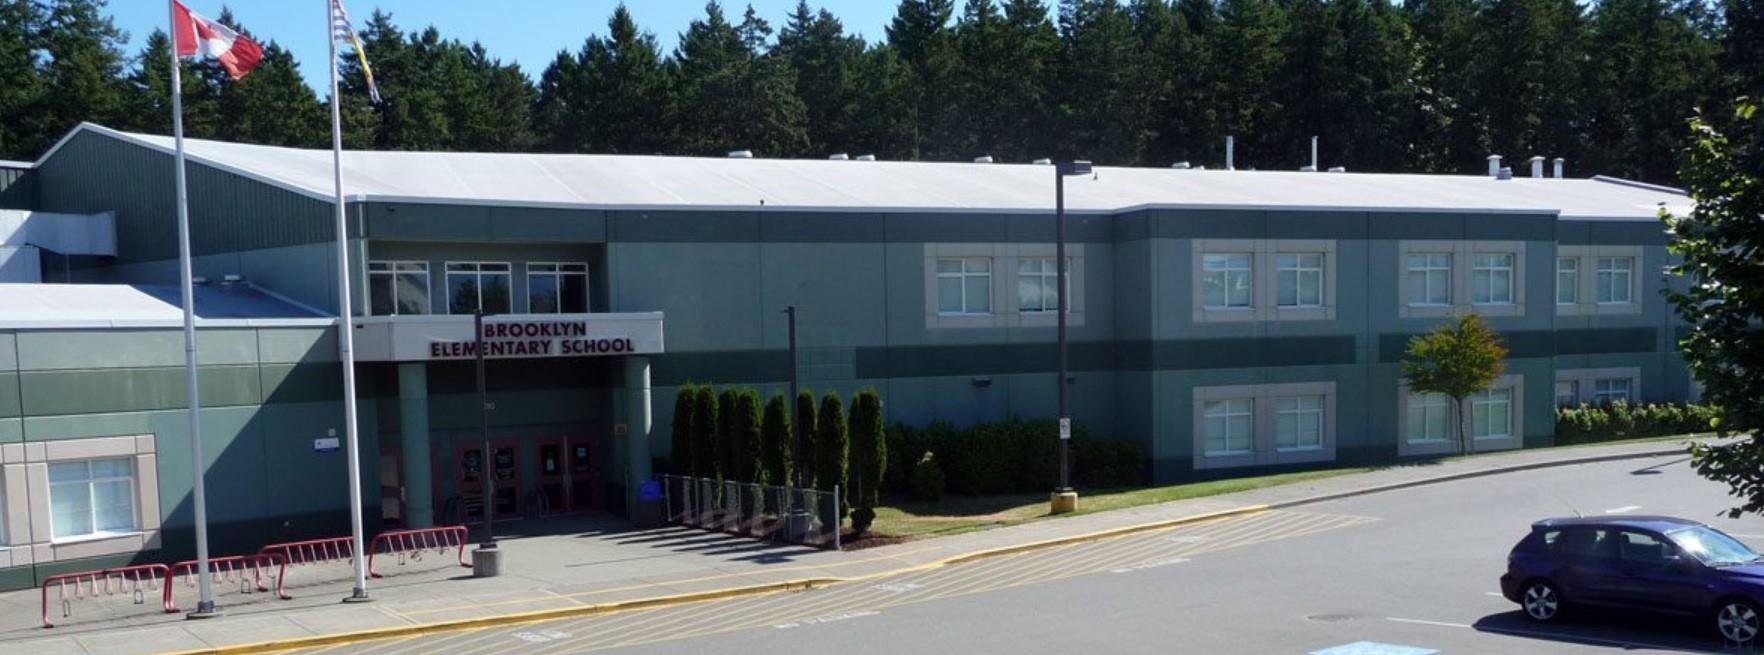 Comox Valley Glass & Mirror Ltd in Courtenay